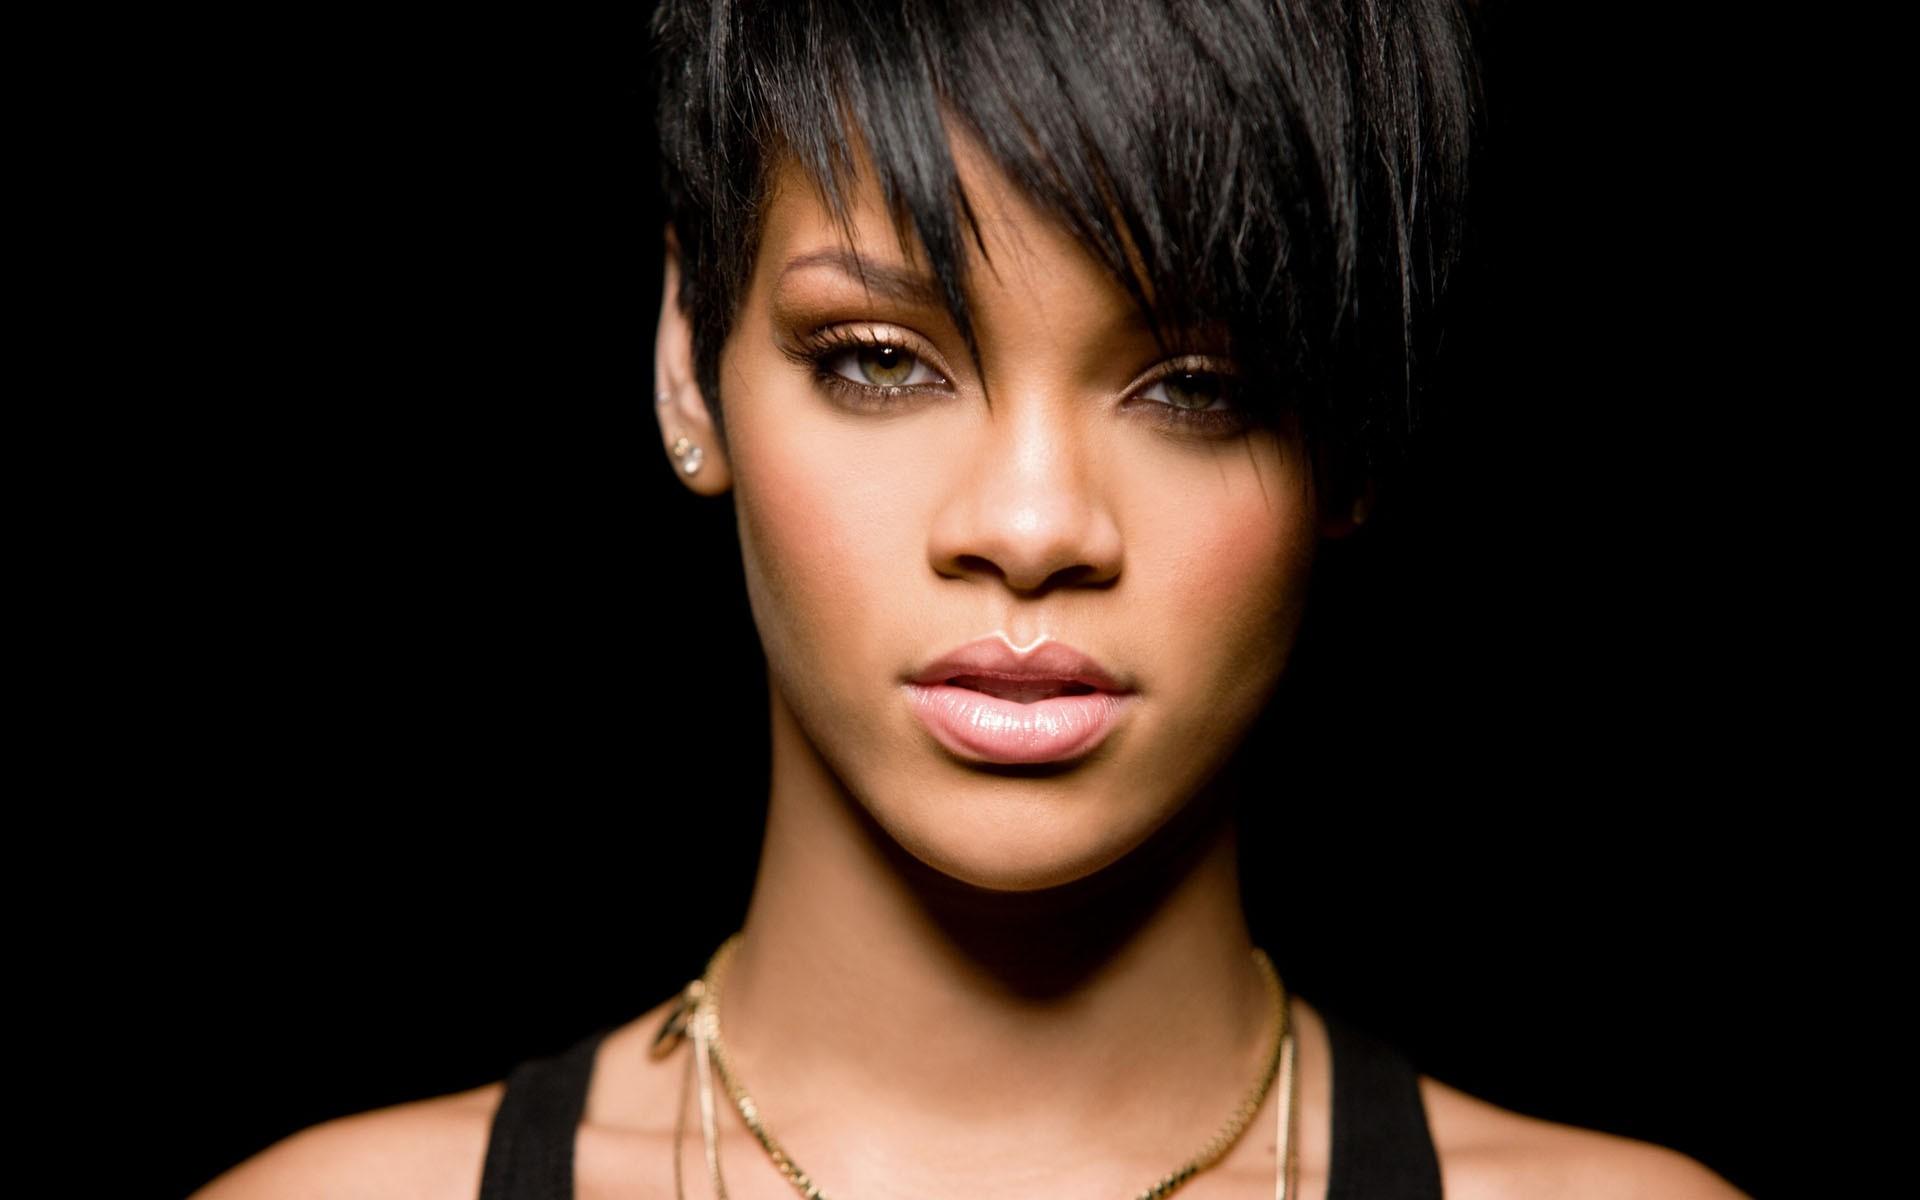 Rihanna-Hairstyle.jpg